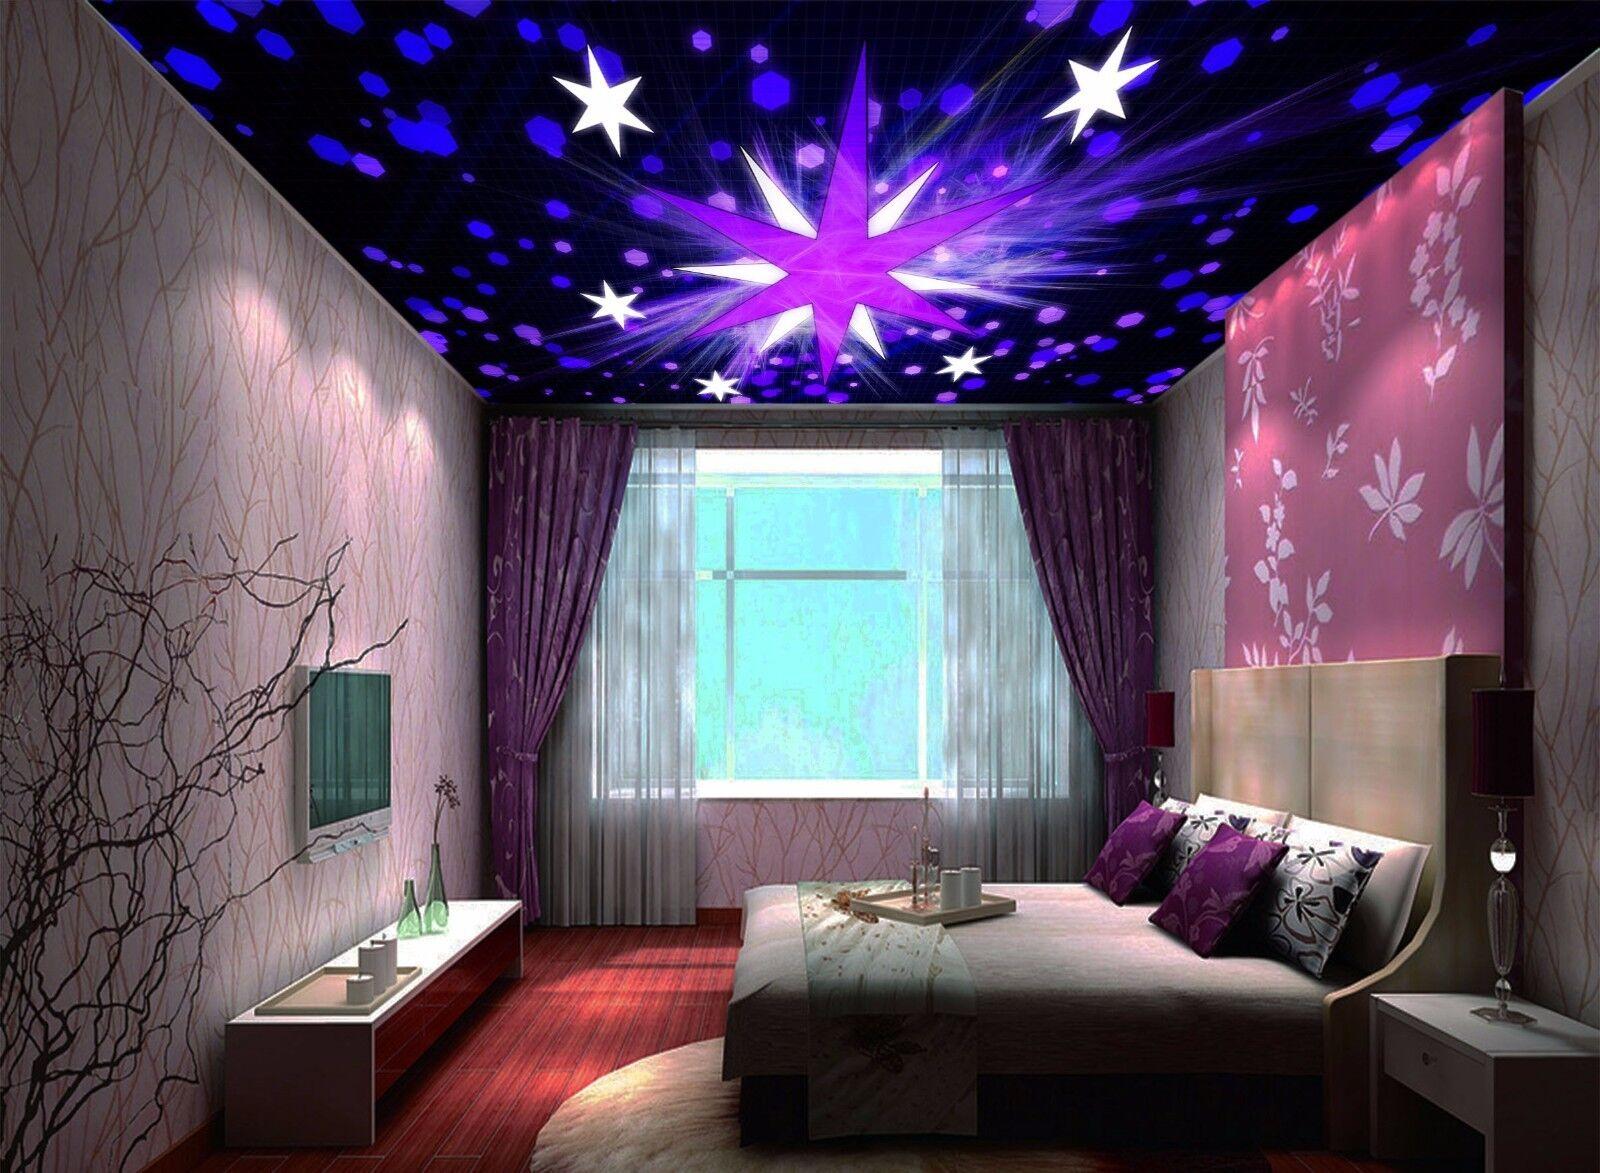 3D Star Purple Ceiling WallPaper Murals Wall Print Decal AJ WALLPAPER US